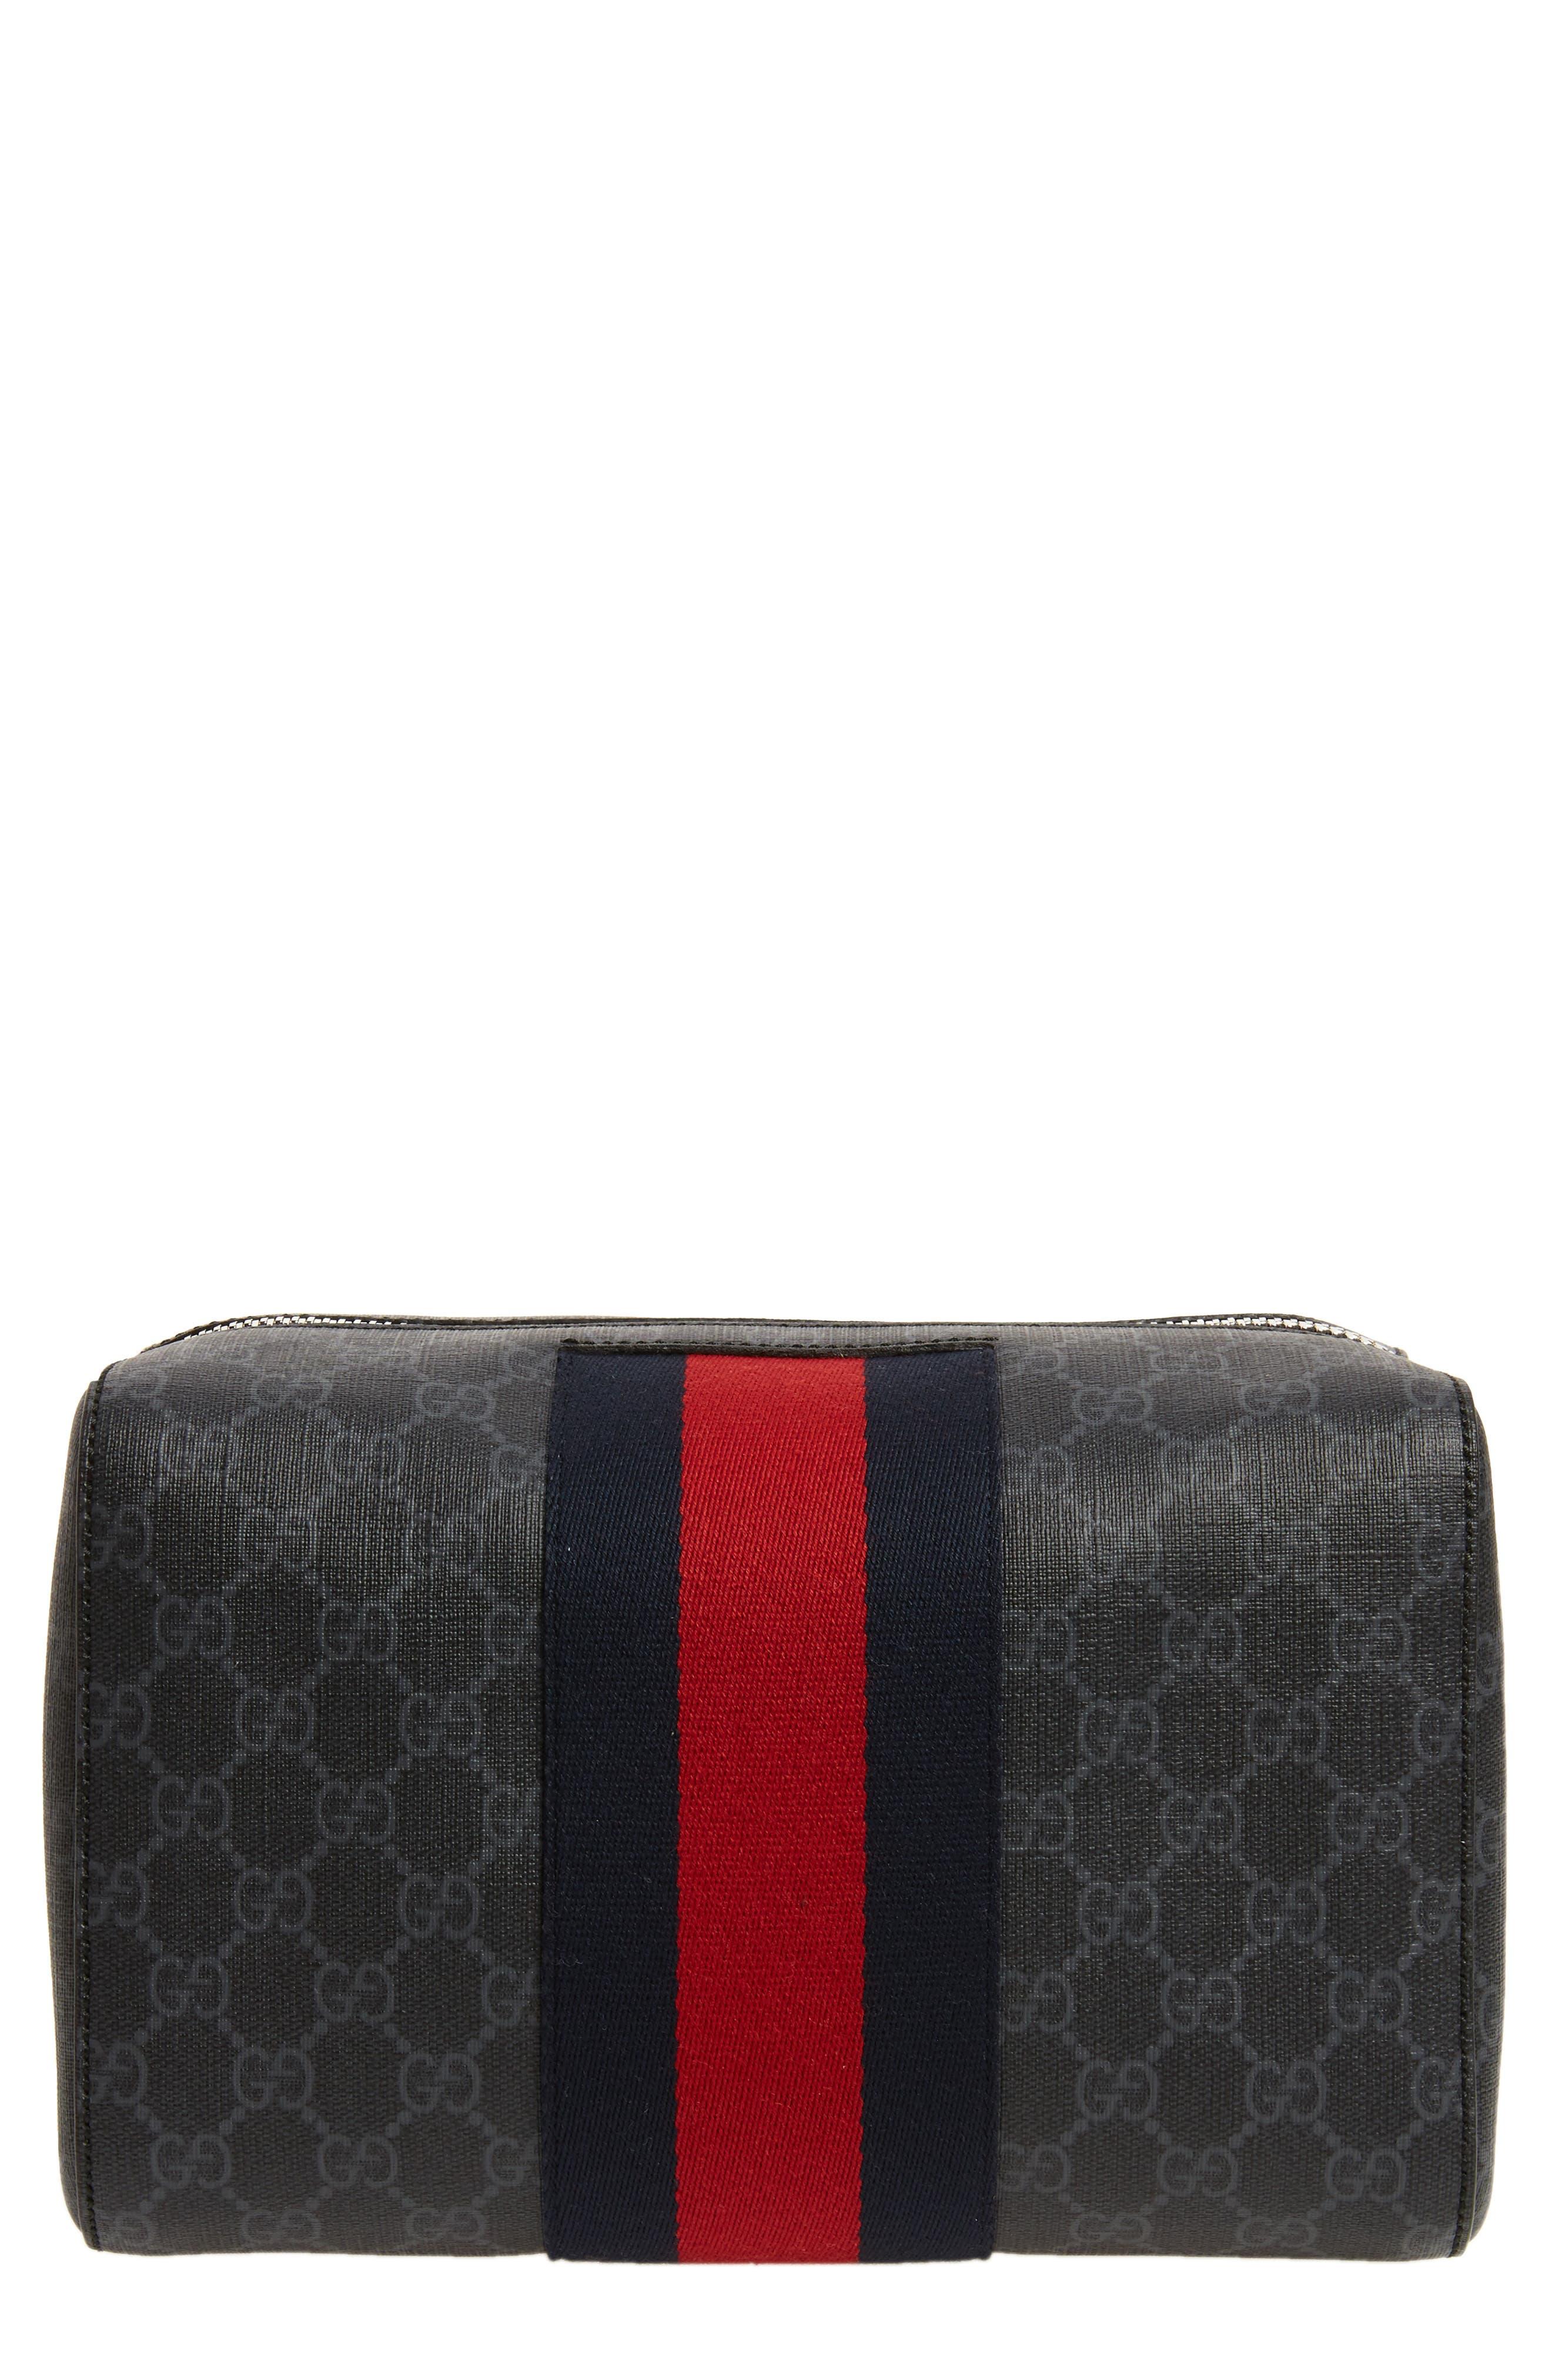 Gucci GG Supreme Hand Duffel Bag